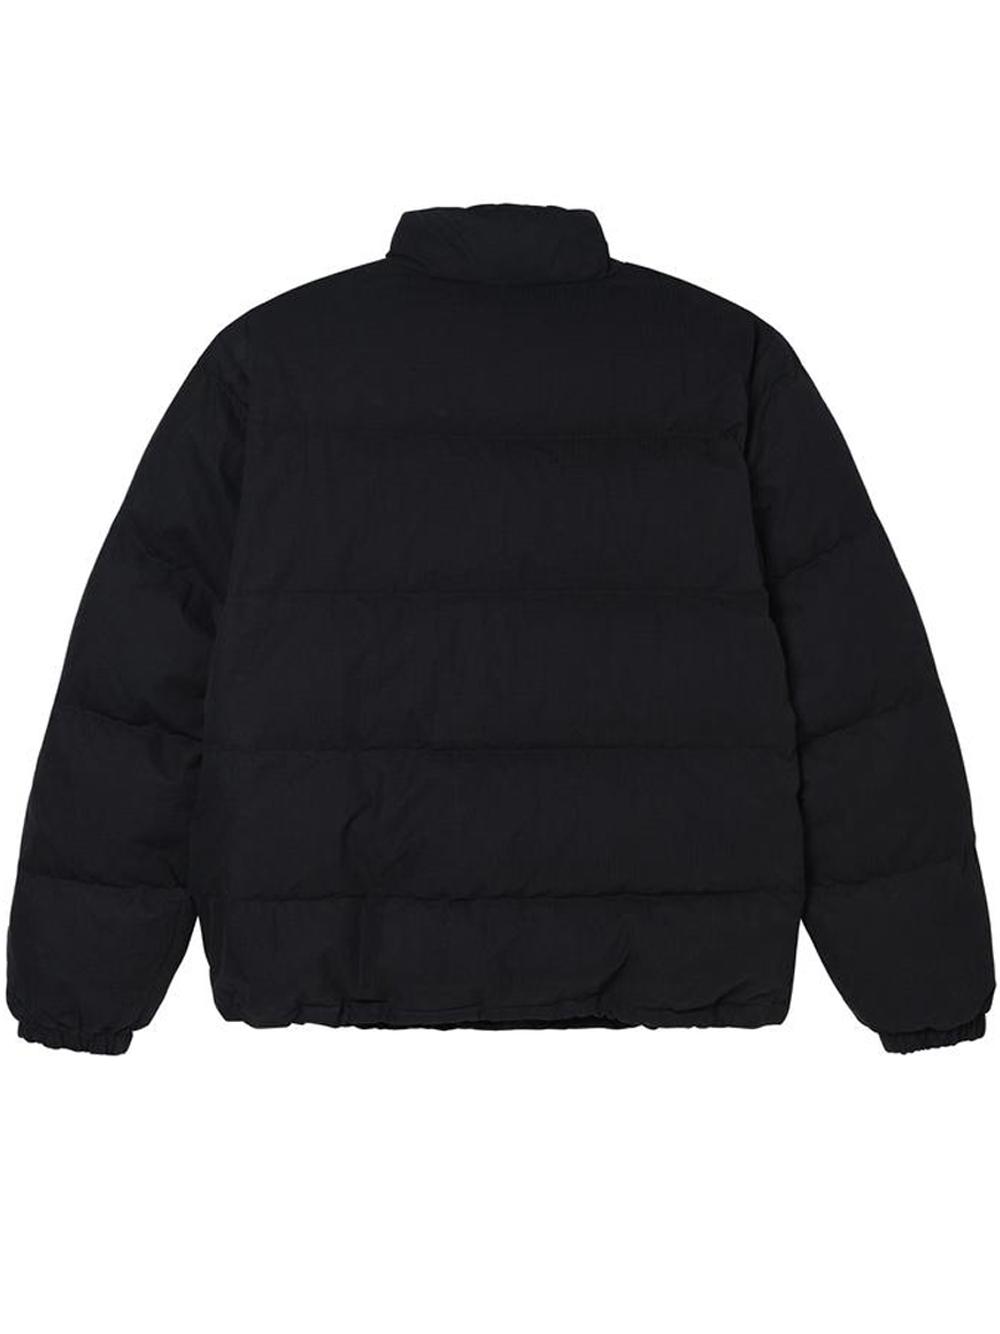 solid puffer jacket man black STUSSY | Jackets | 115544BLACK